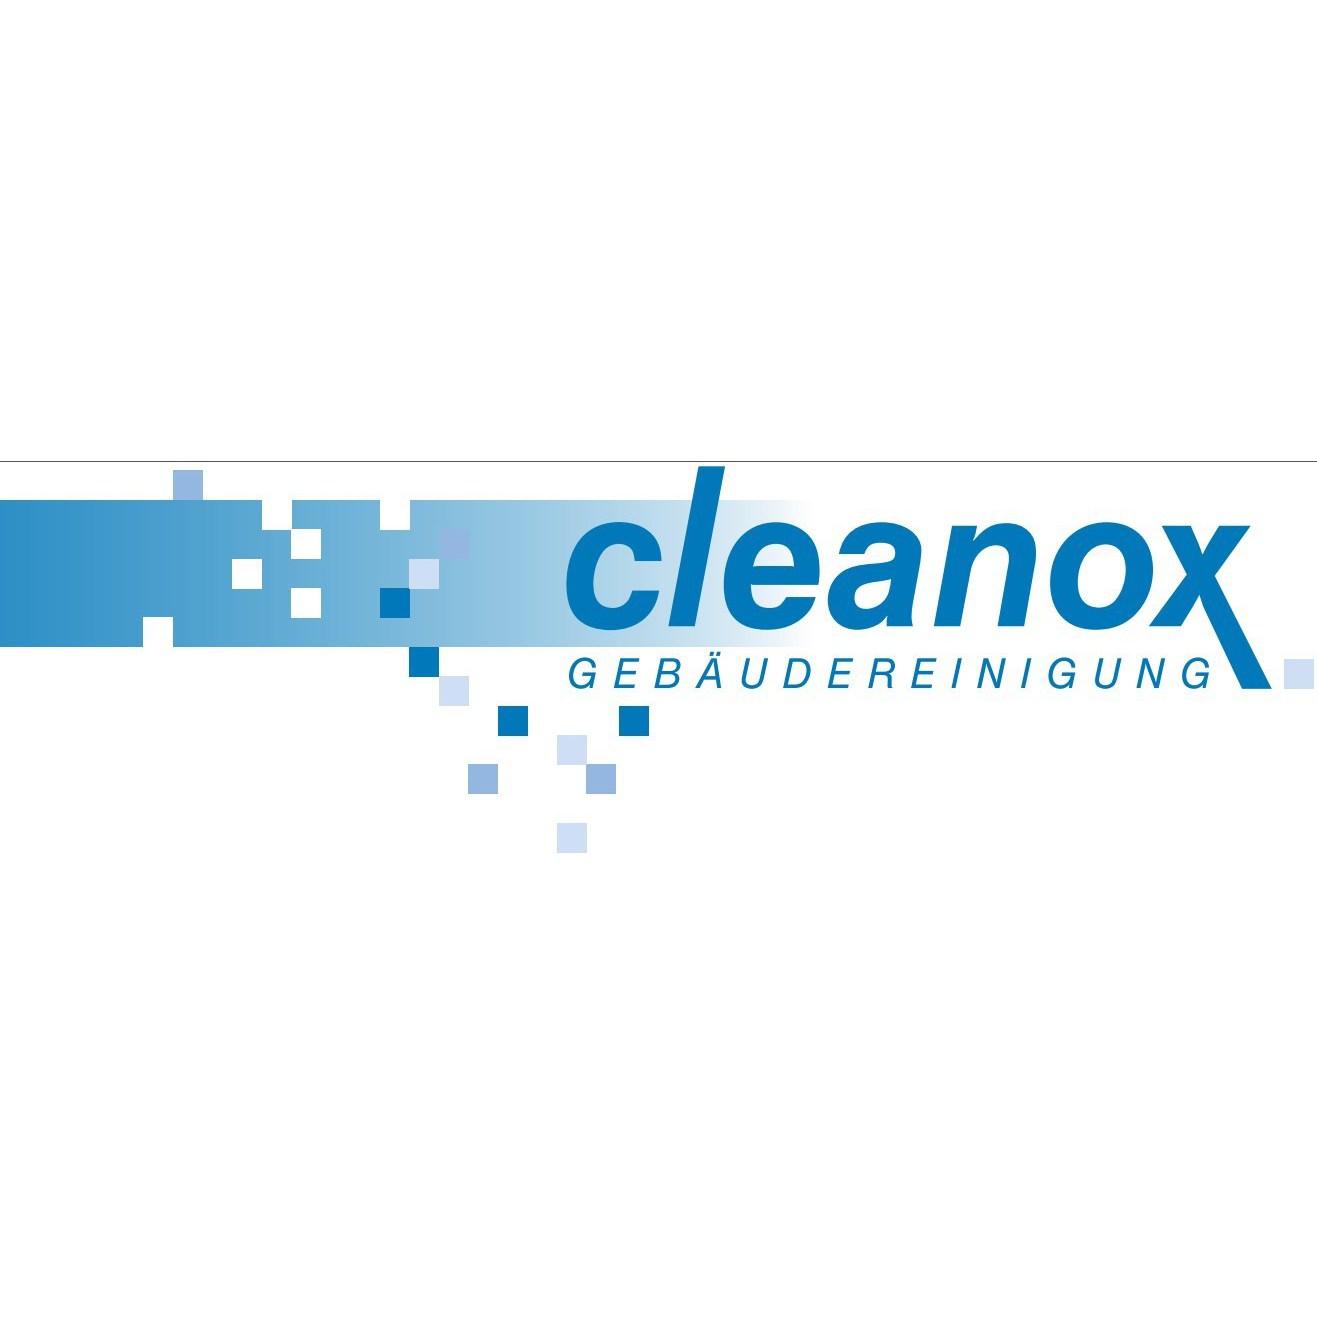 Bild zu cleanox GmbH & Co. KG in Pößneck